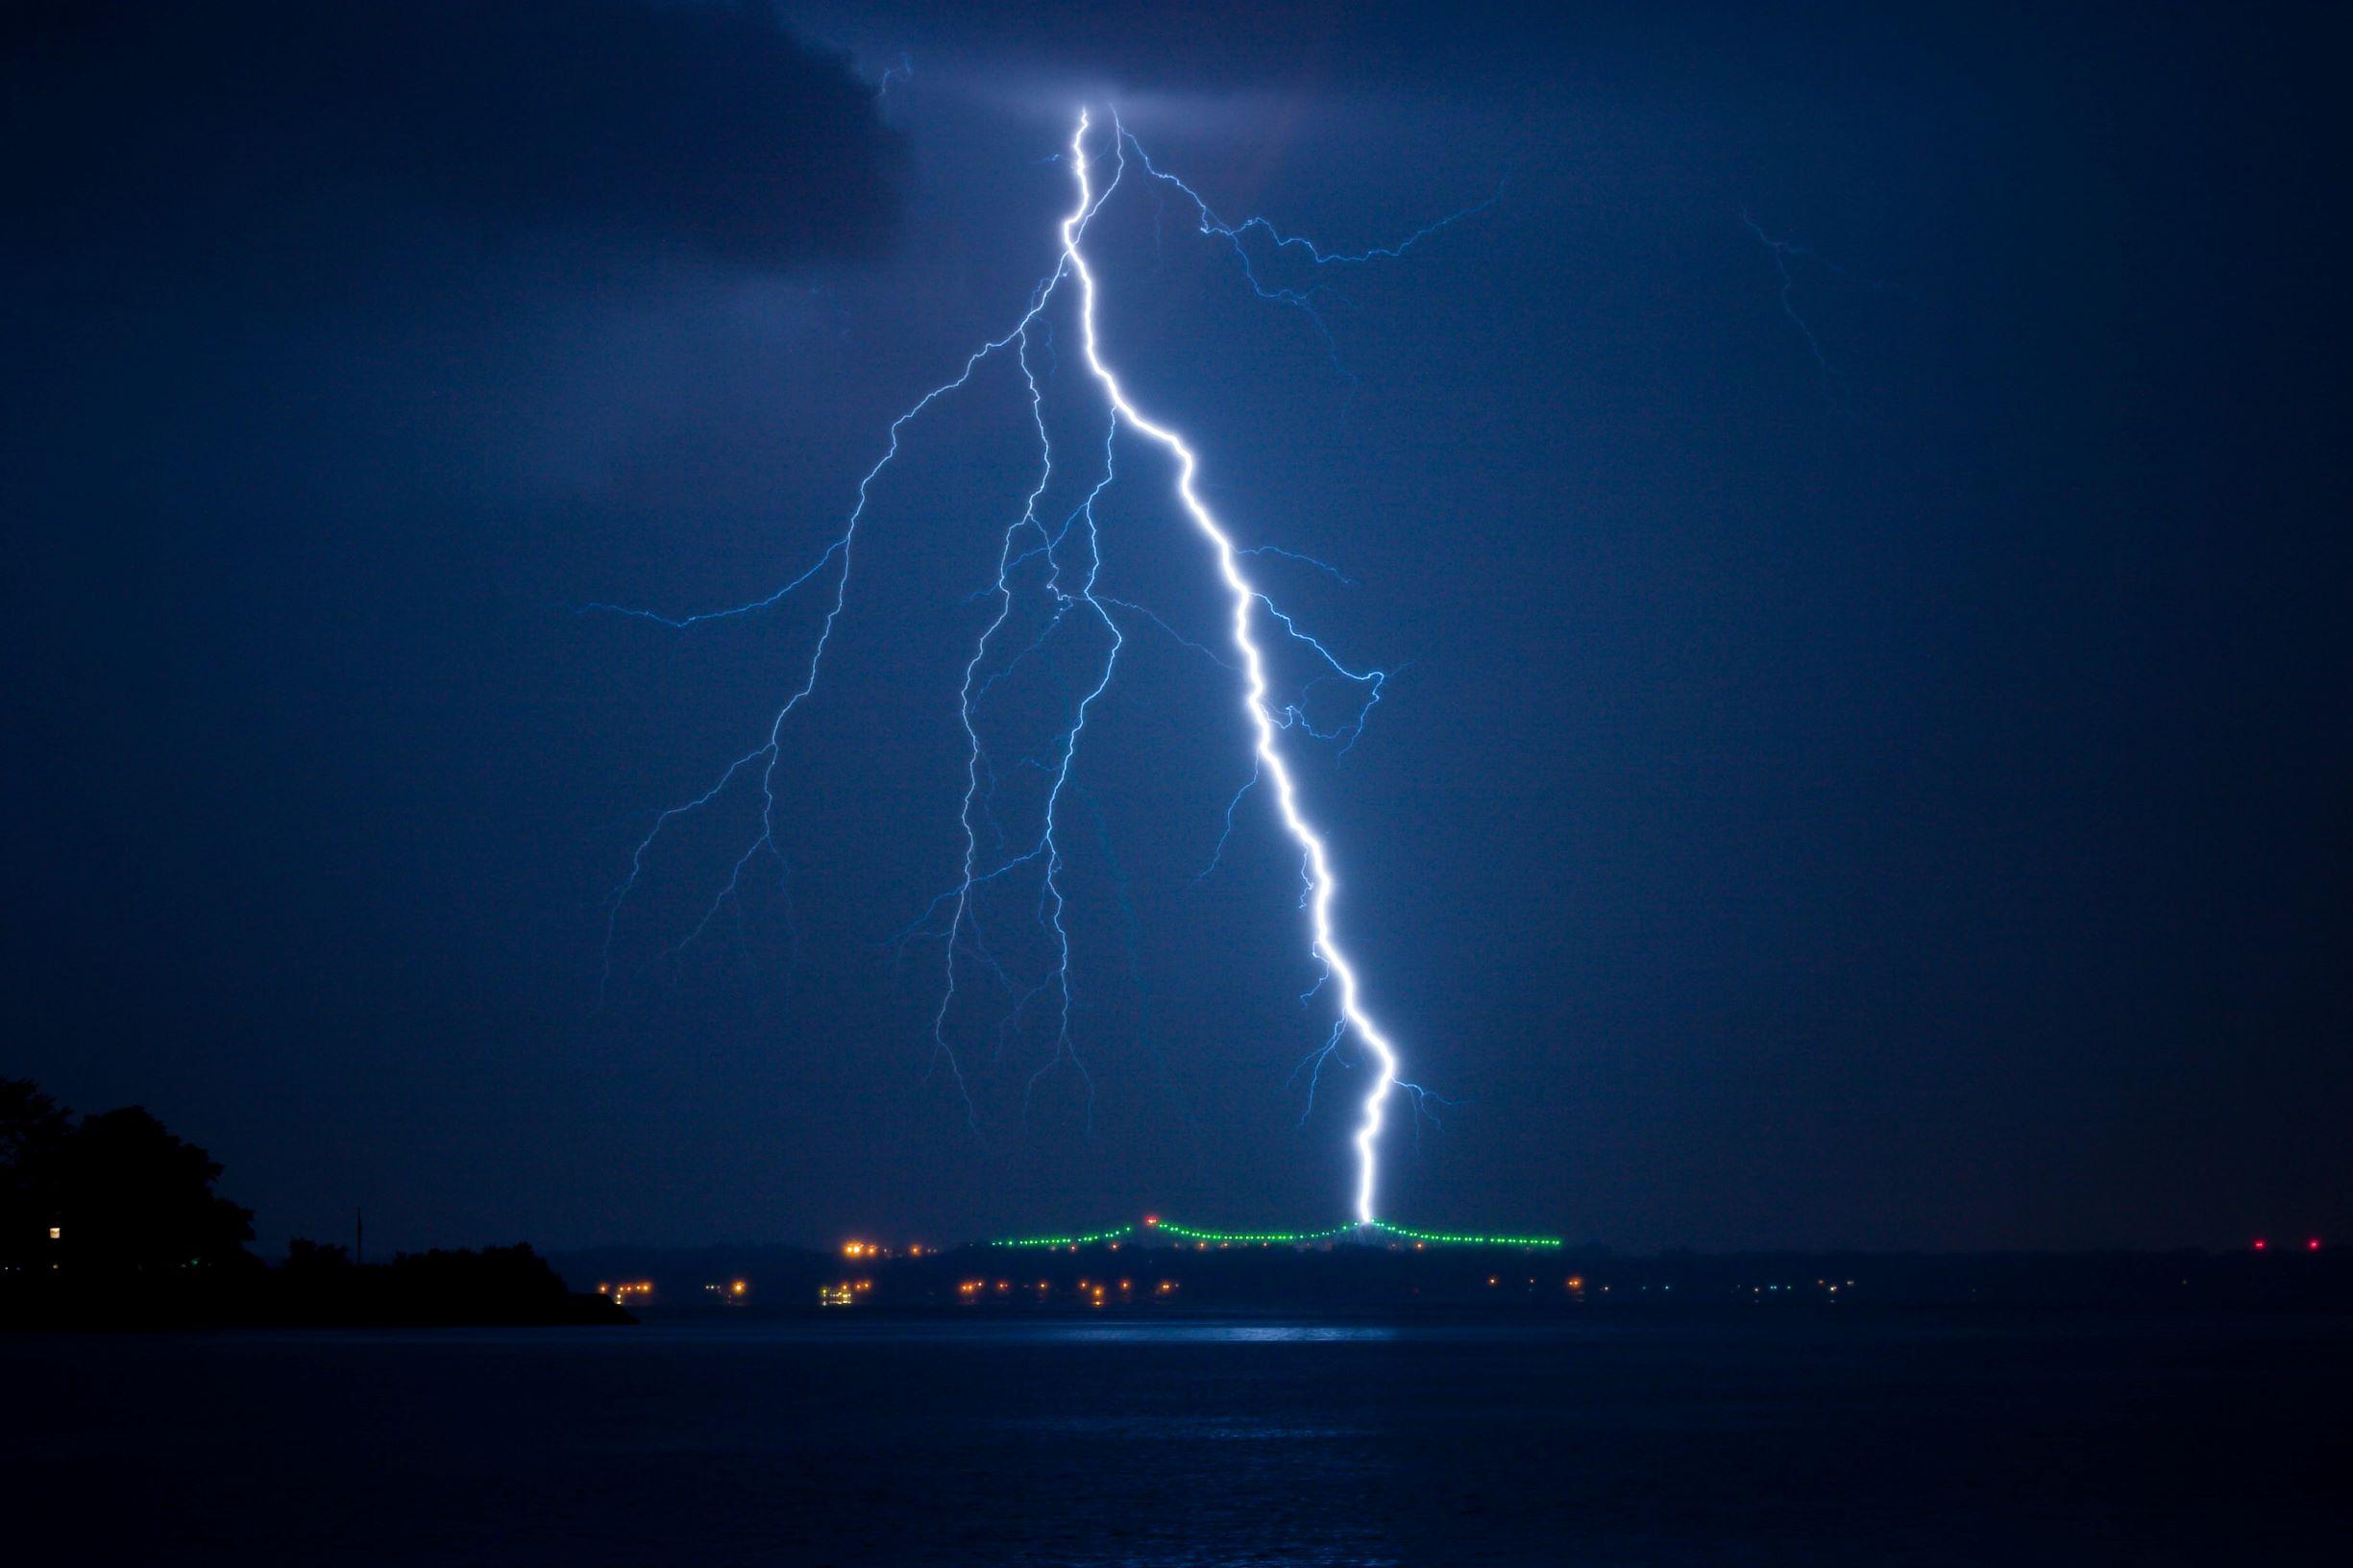 Blitzsschutz